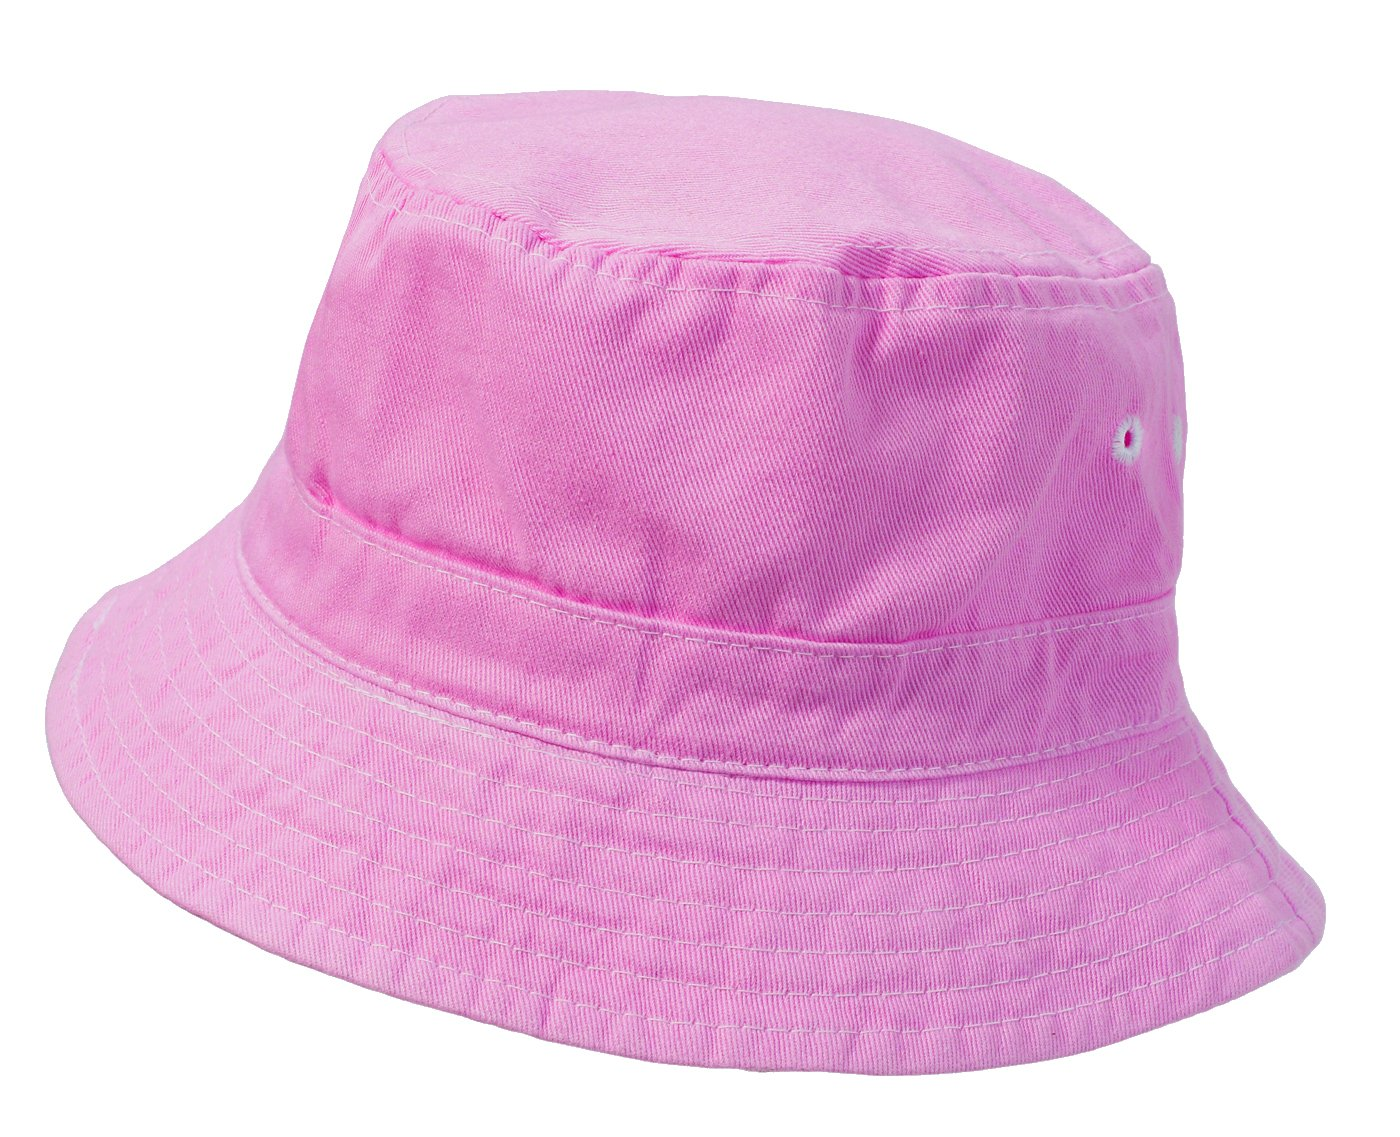 City Thread Little Boys' and Girls' Solid Wharf Hat Bucket Hat for Sun Protection SPF Beach Summer - Medium Pink - XL(4-6)